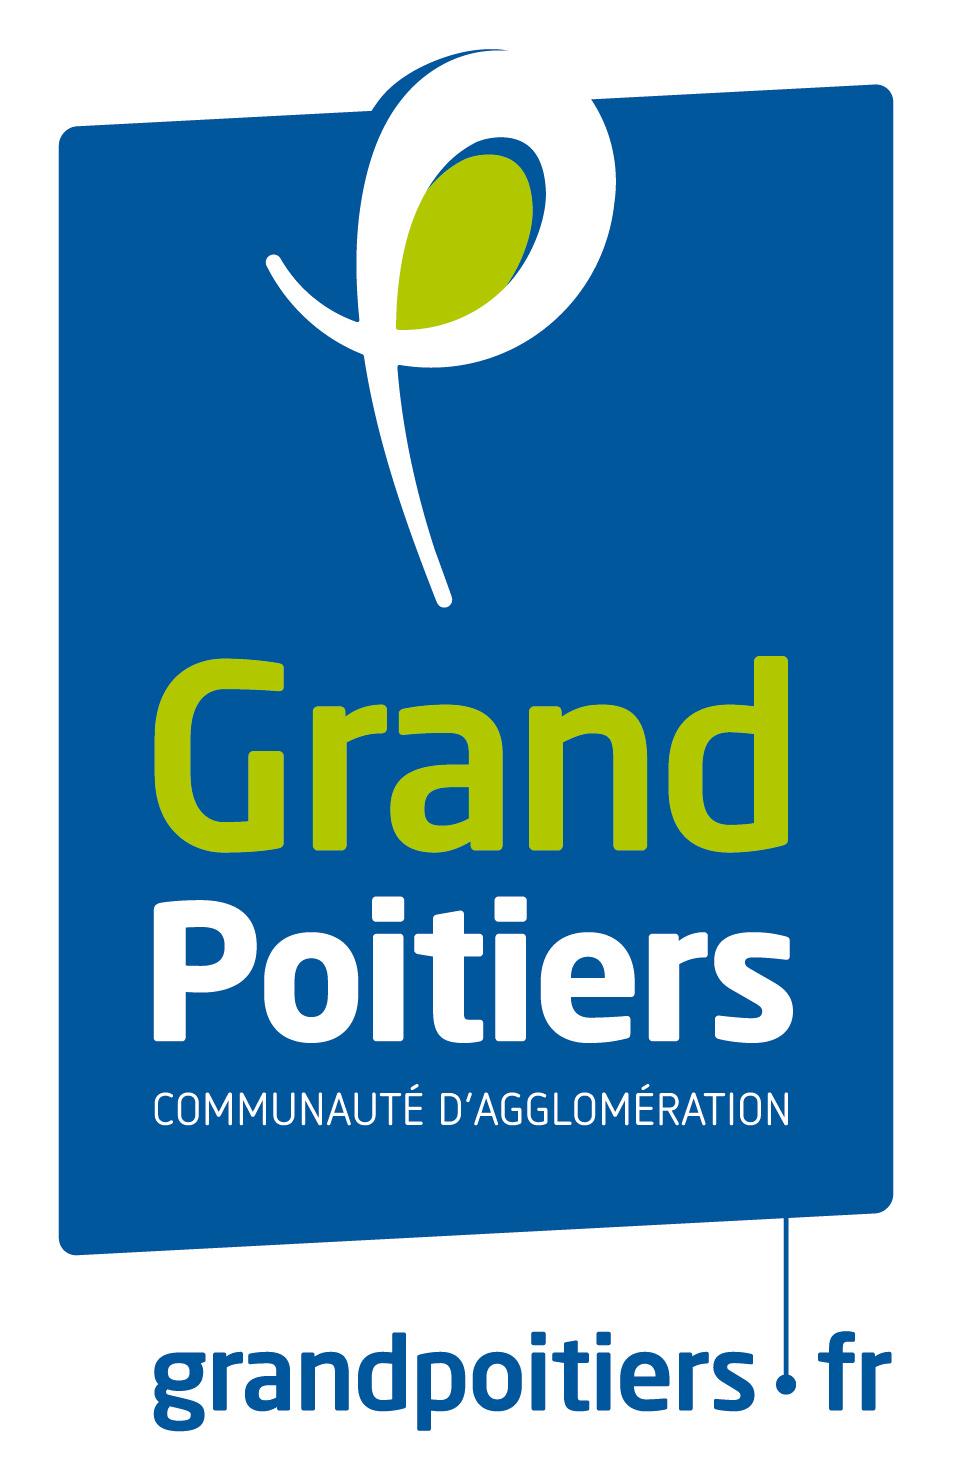 Grand-Poitiers logo